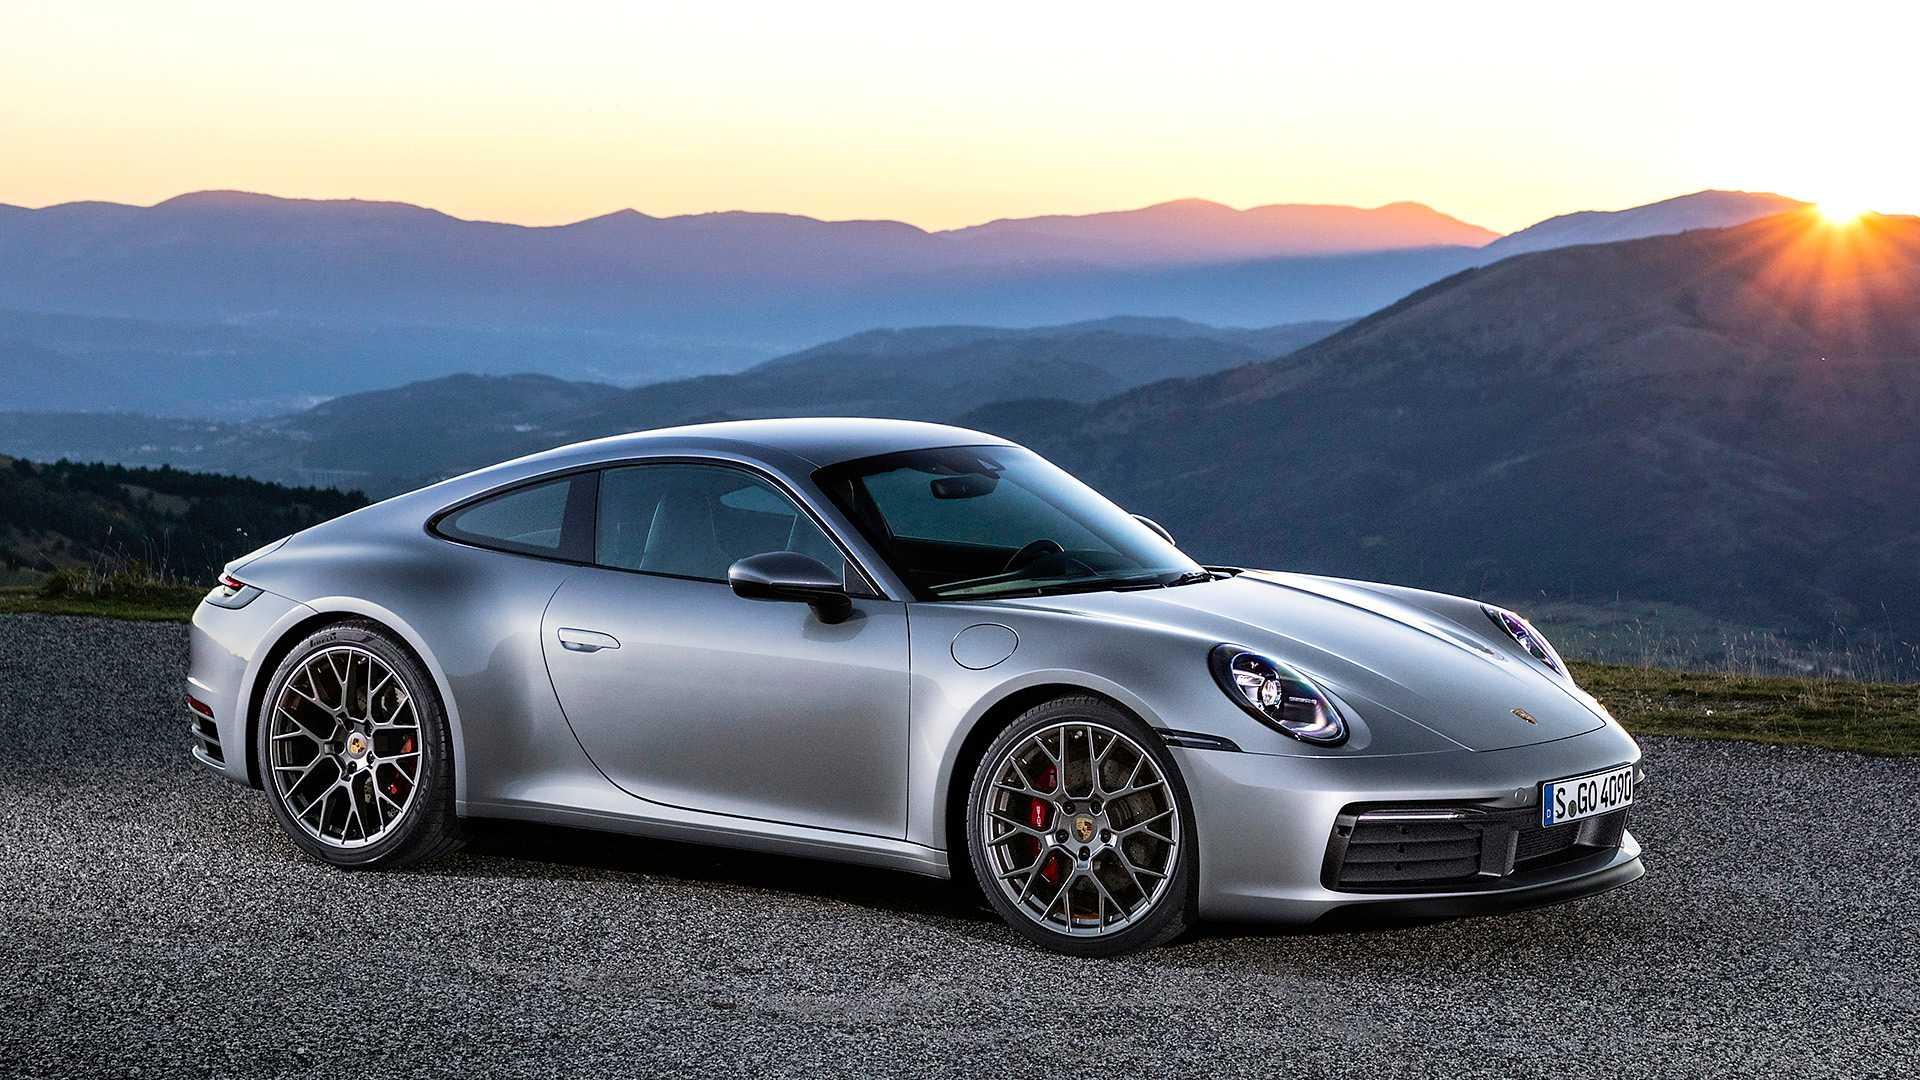 2019-Porsche-911-Carrera-4S-992_3